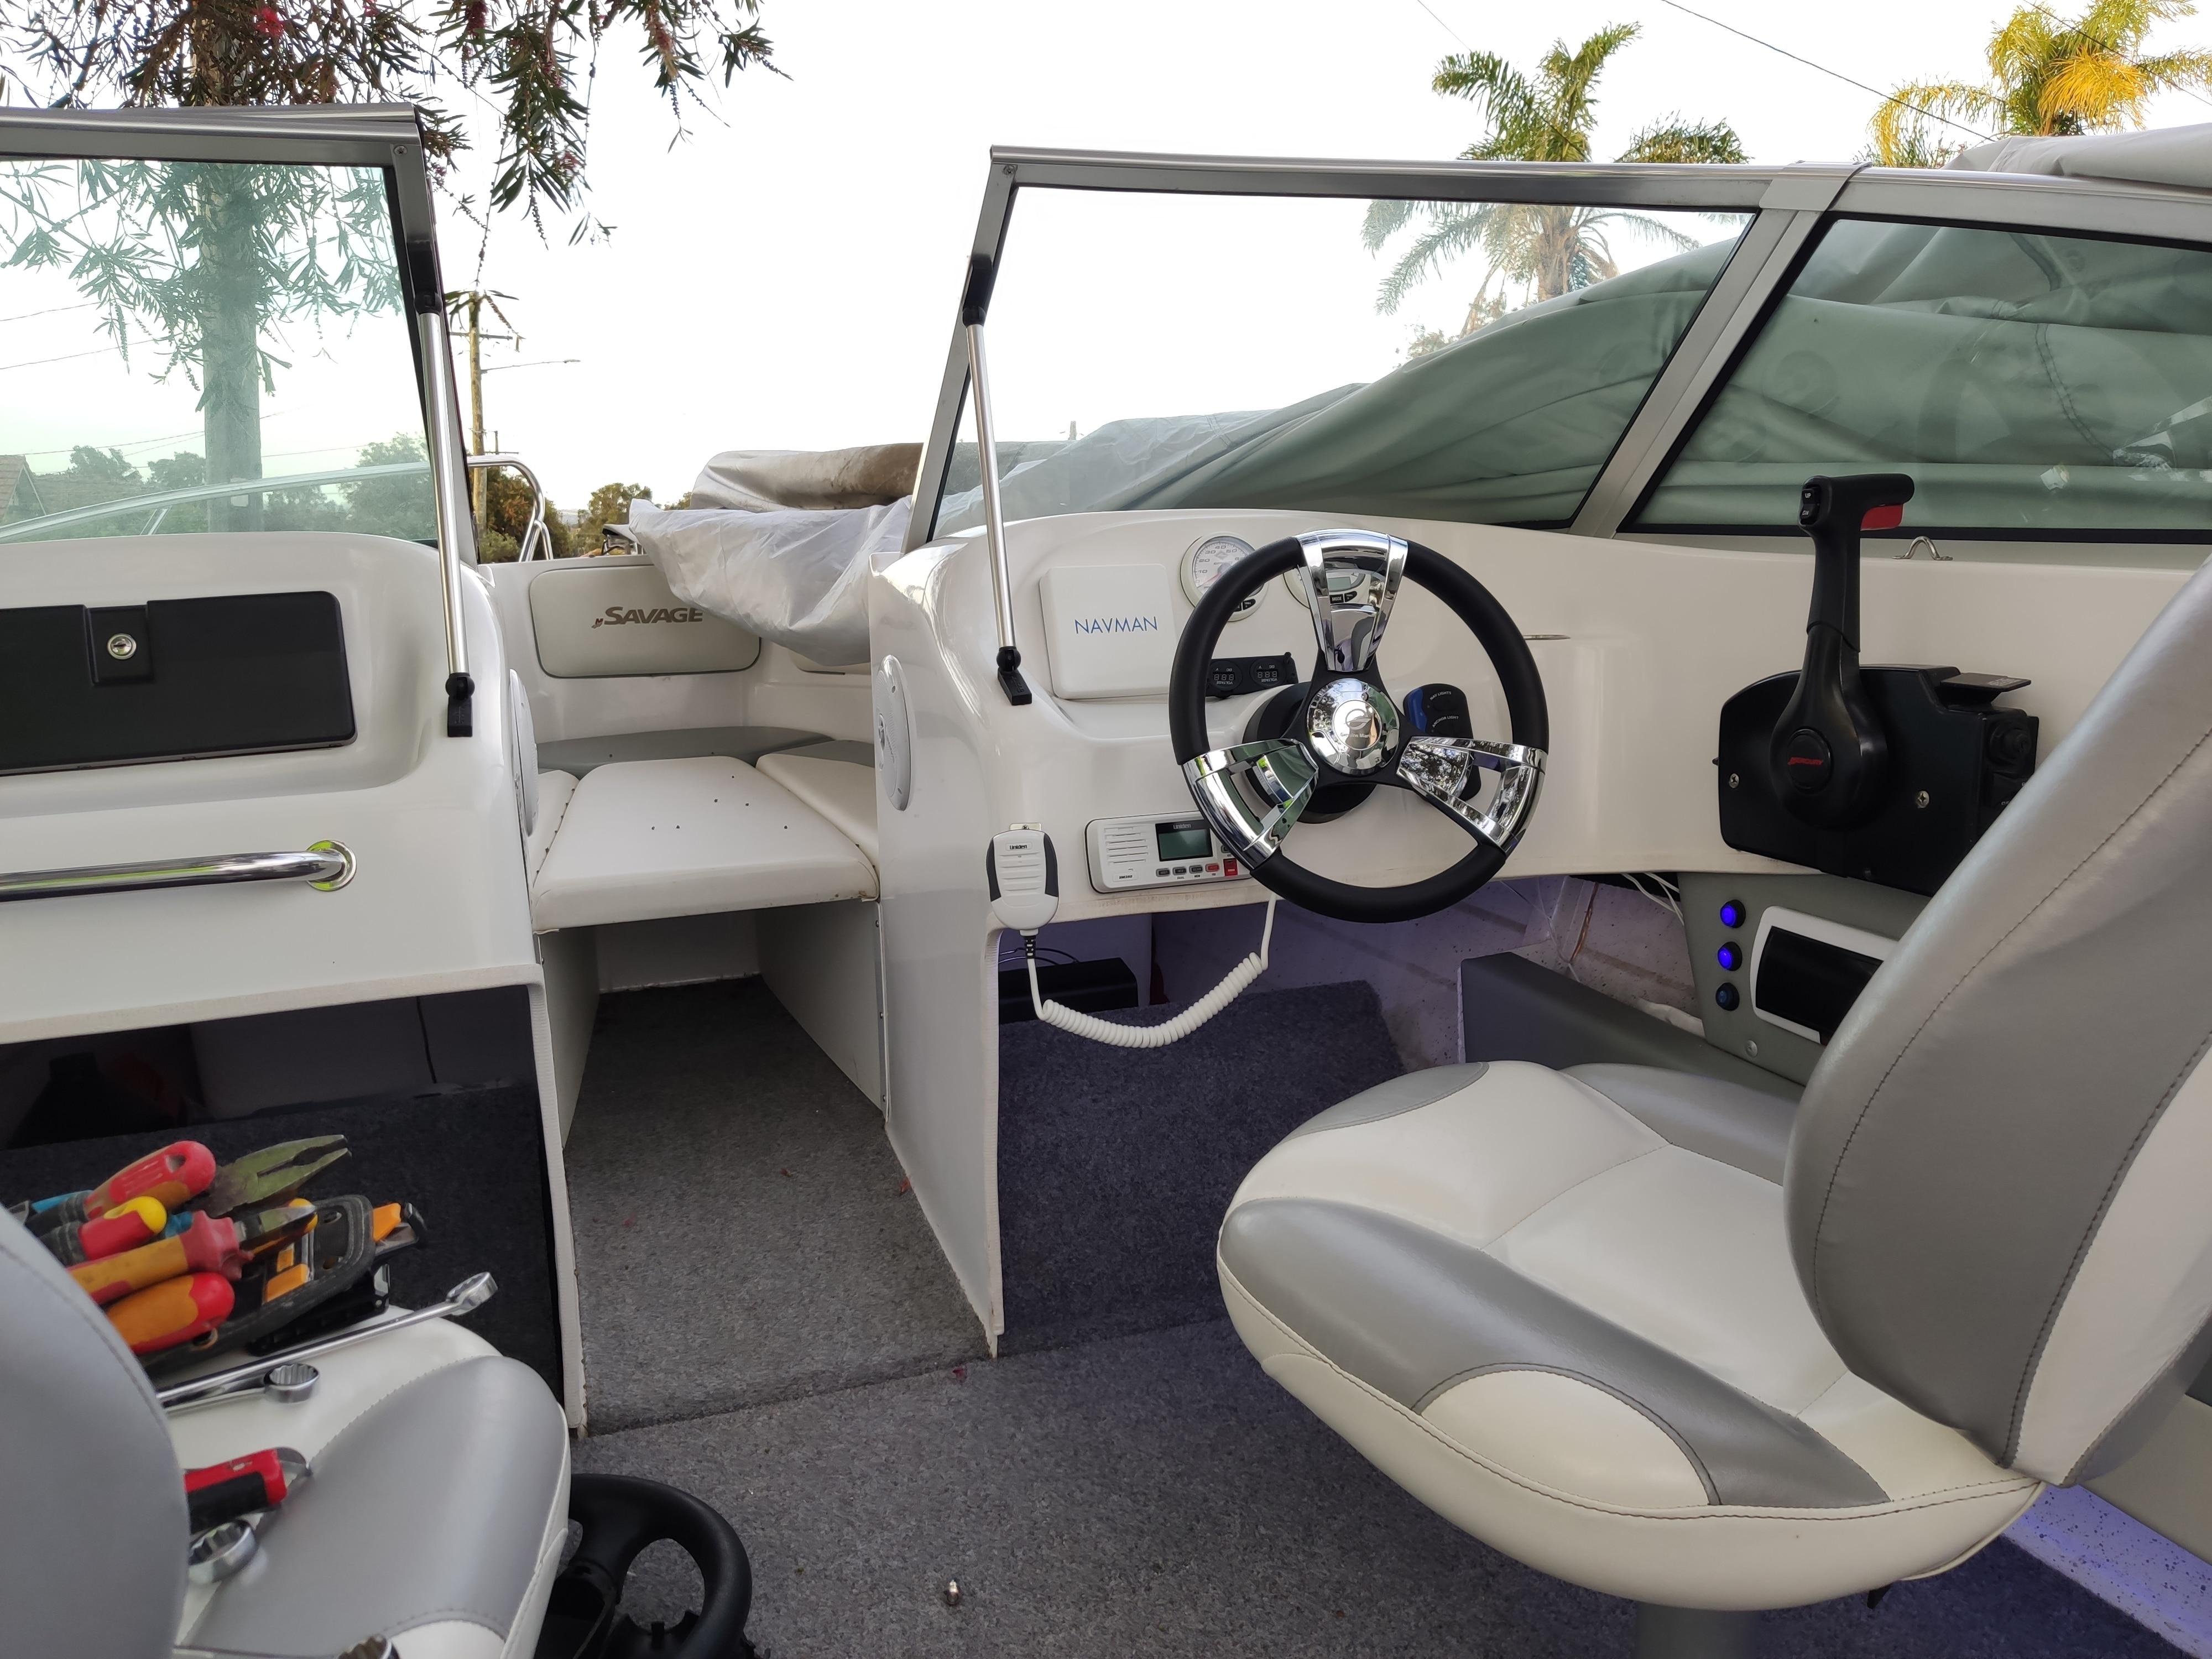 Marine 350mm & 3/4 Inch Shaft Polished Chrome 3 Spoke Steering Wheel for Vessels Yacht Speedboat Boat Accessories enlarge